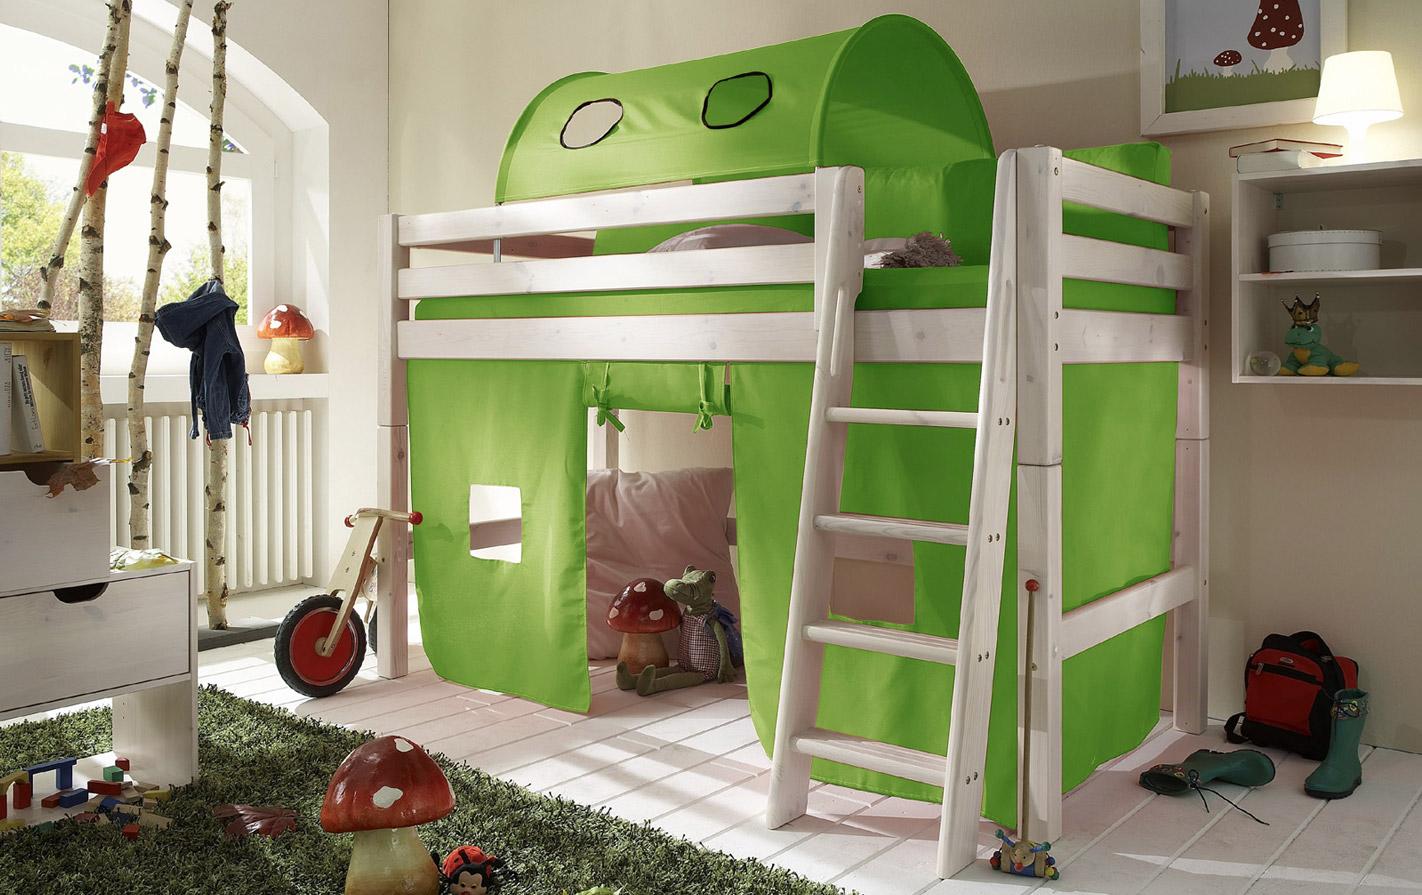 Limefarbener Spielvorhang Mini-Hochbett in unifarben